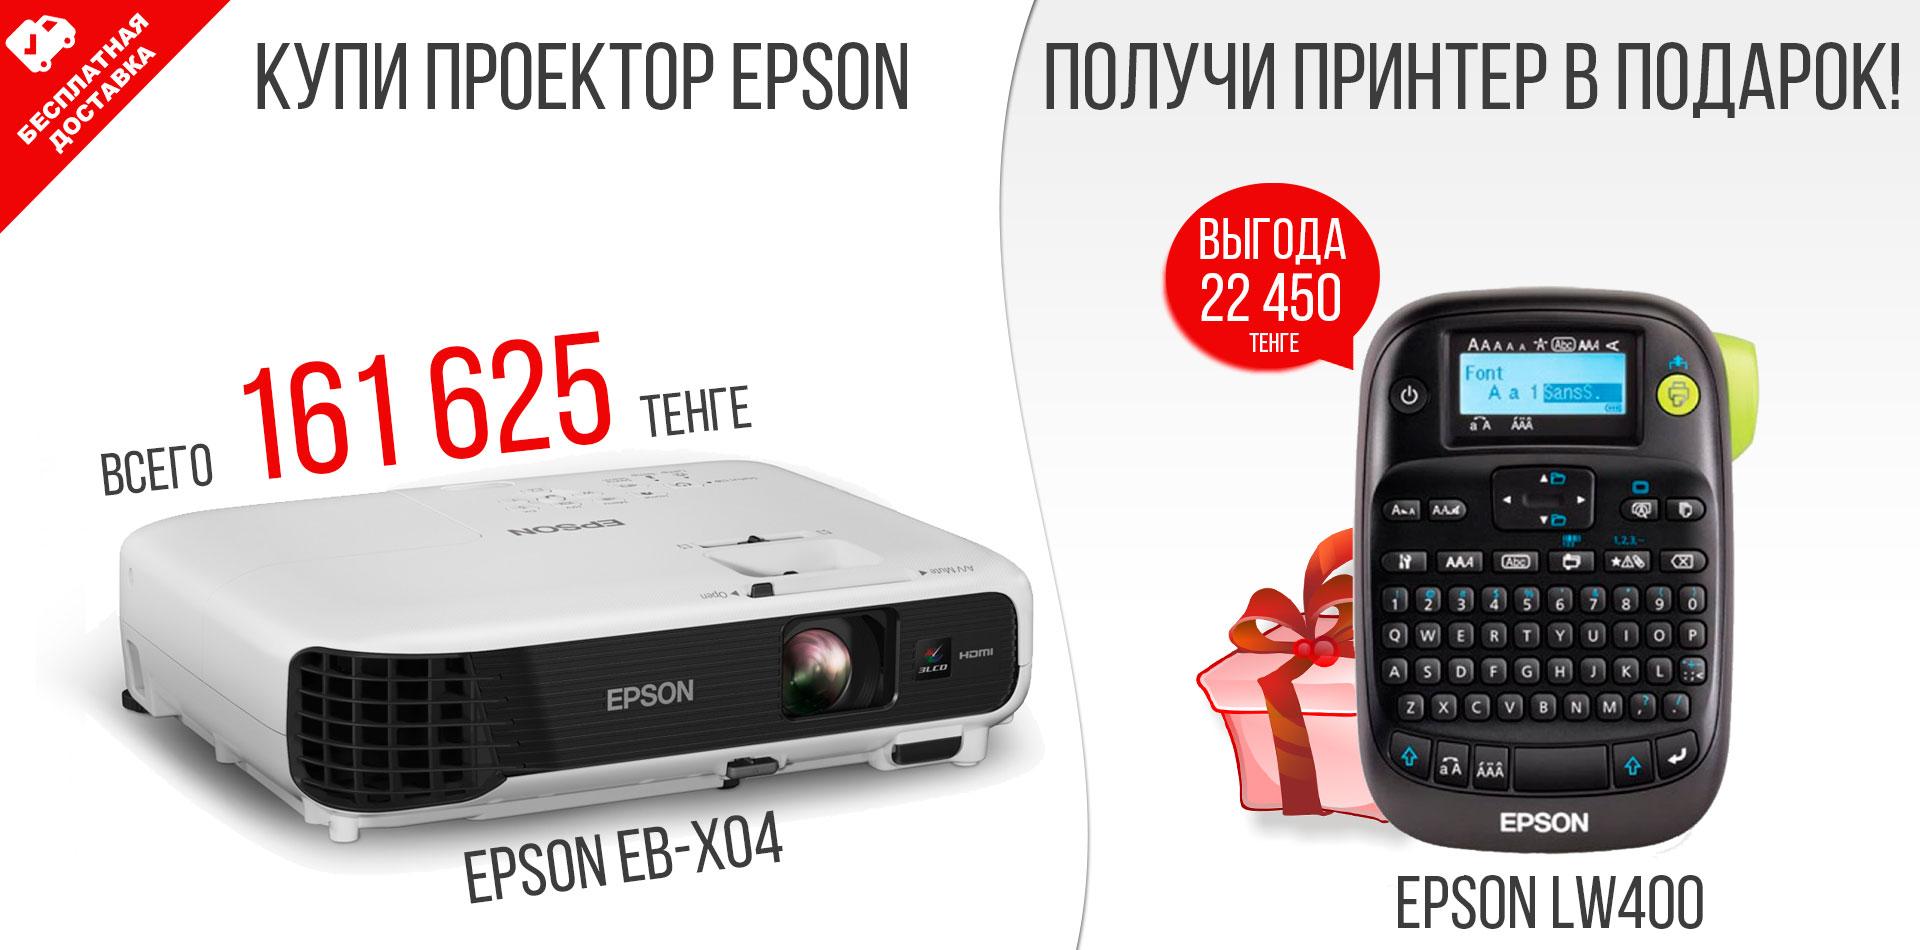 ПРОЕКТОР EPSON EB-X04 В АСТАНЕ.